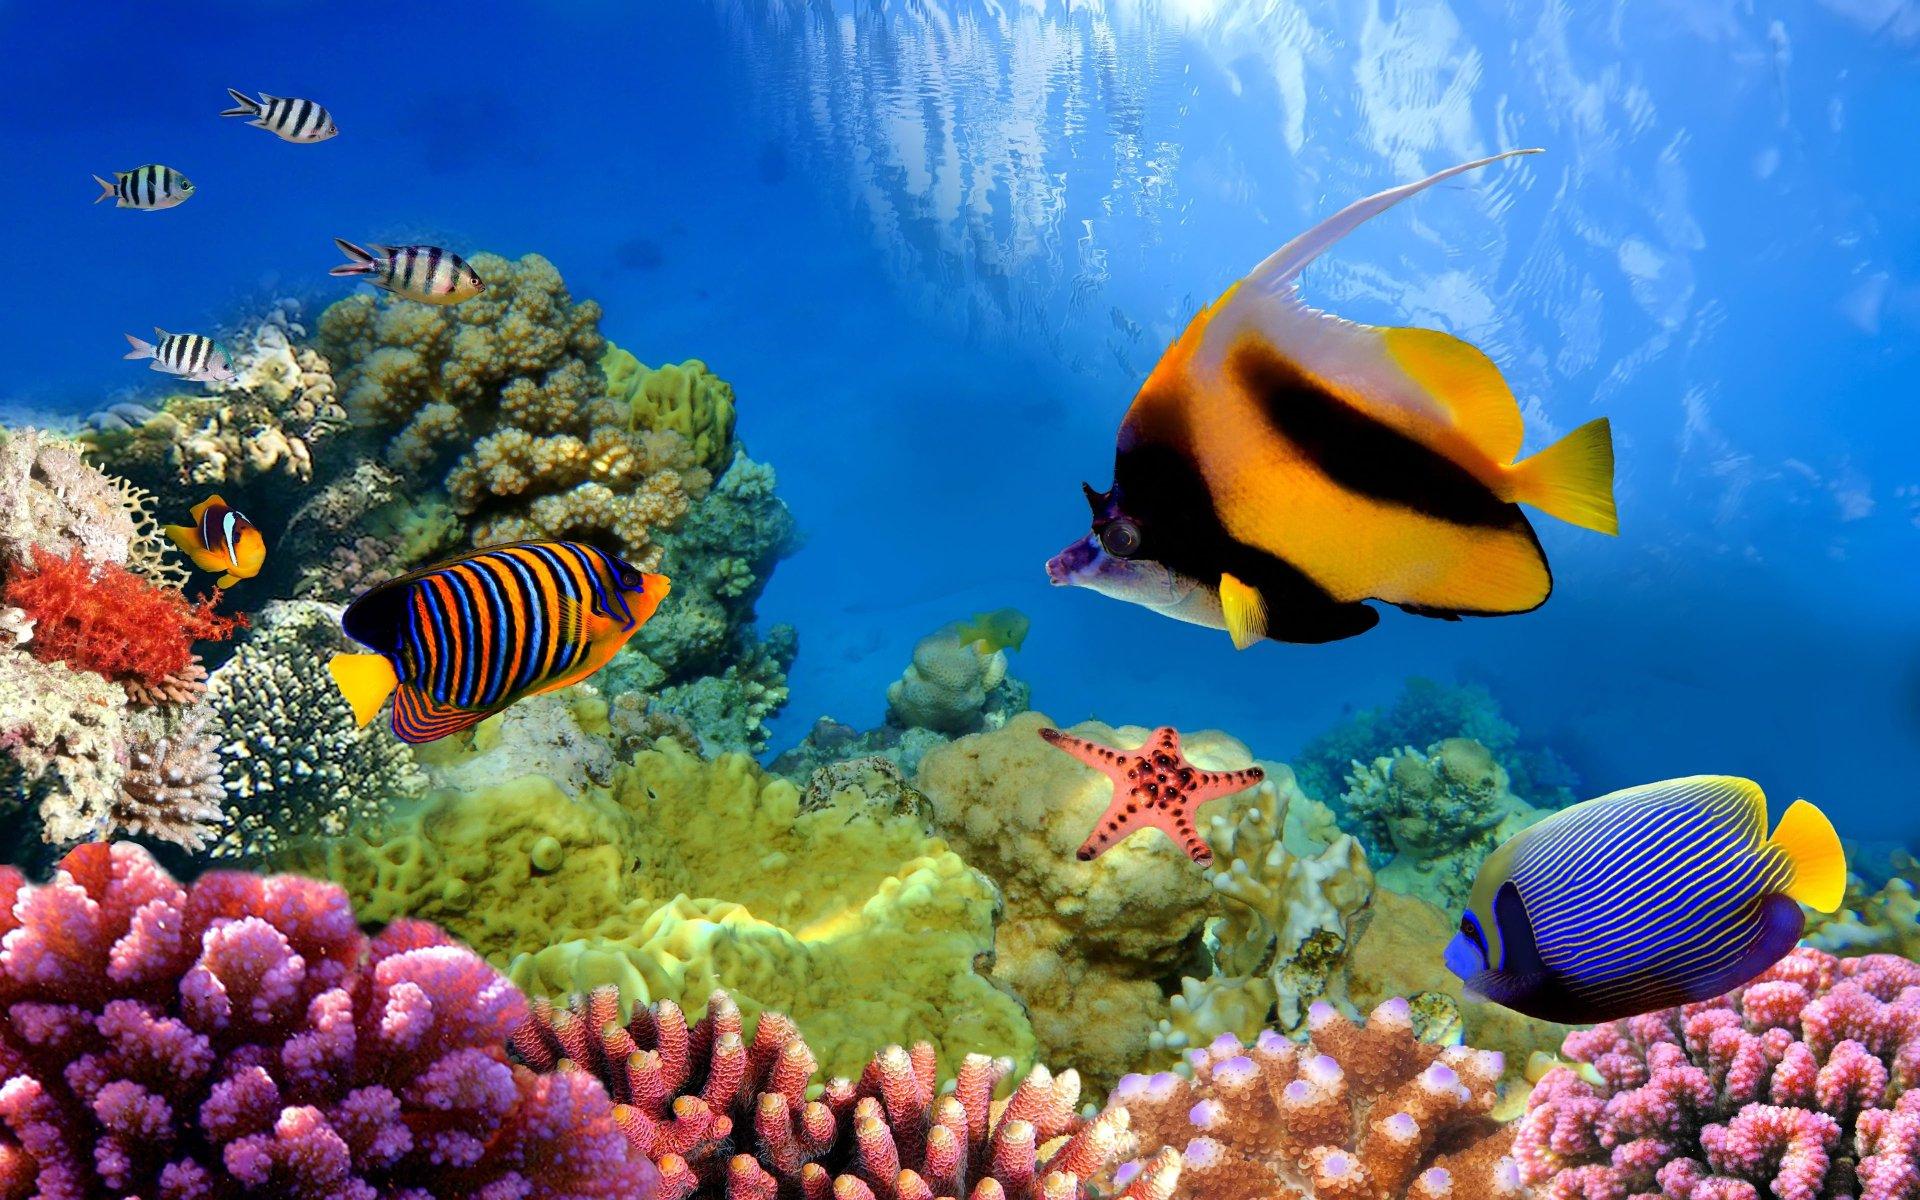 Iphone 7 Plus Hd Wallpaper Original Underwater In The Great Barrier Reef 4k Ultra Hd Wallpaper